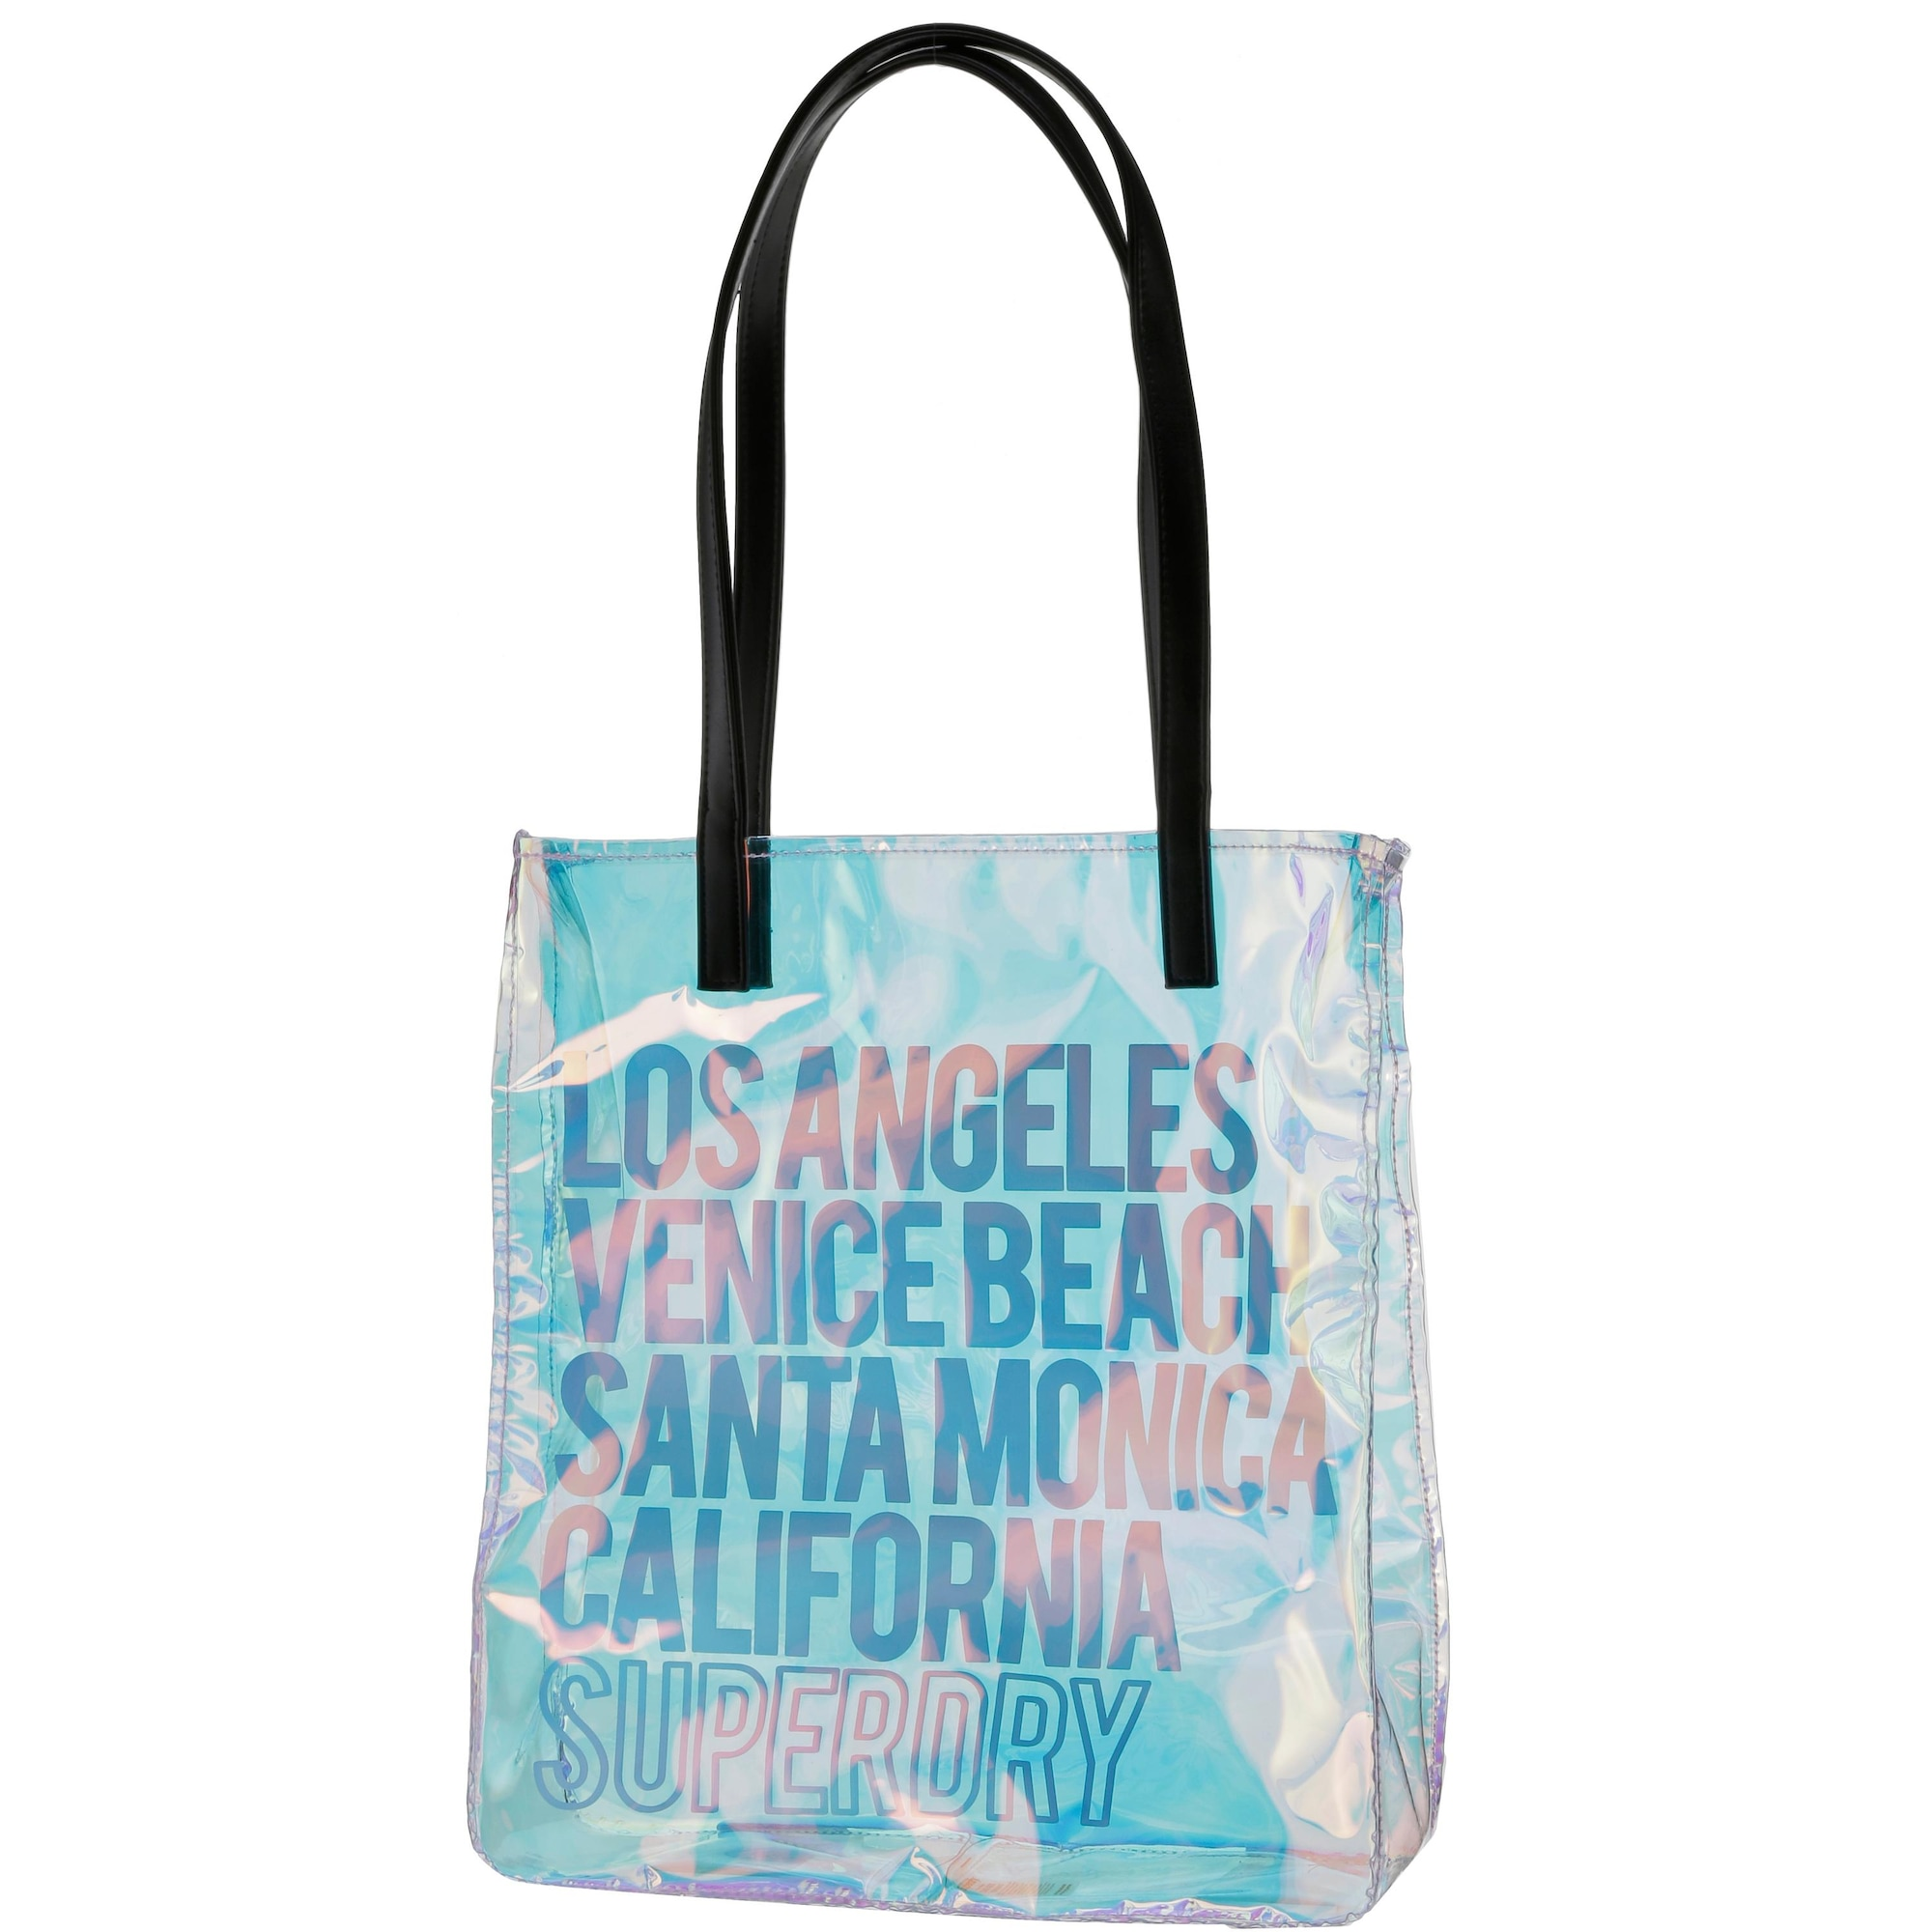 Damen Superdry Shopper  | 05057101480205